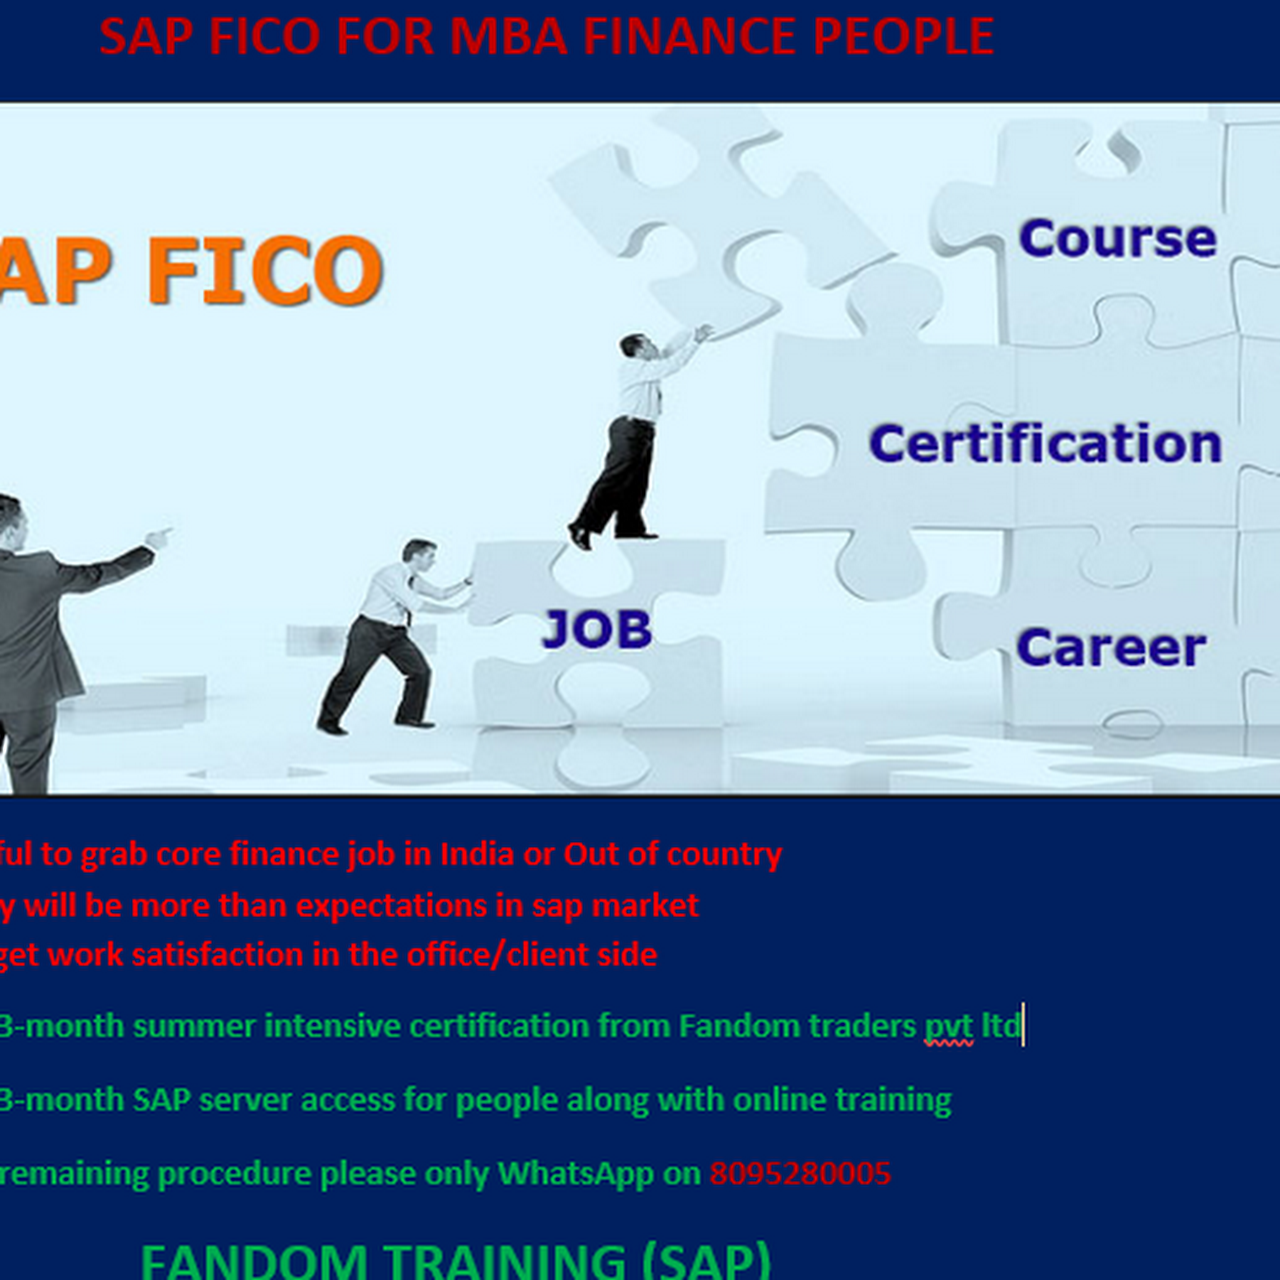 FANDOM TRAINING (SAP) - We are providing SAP training last 5 years